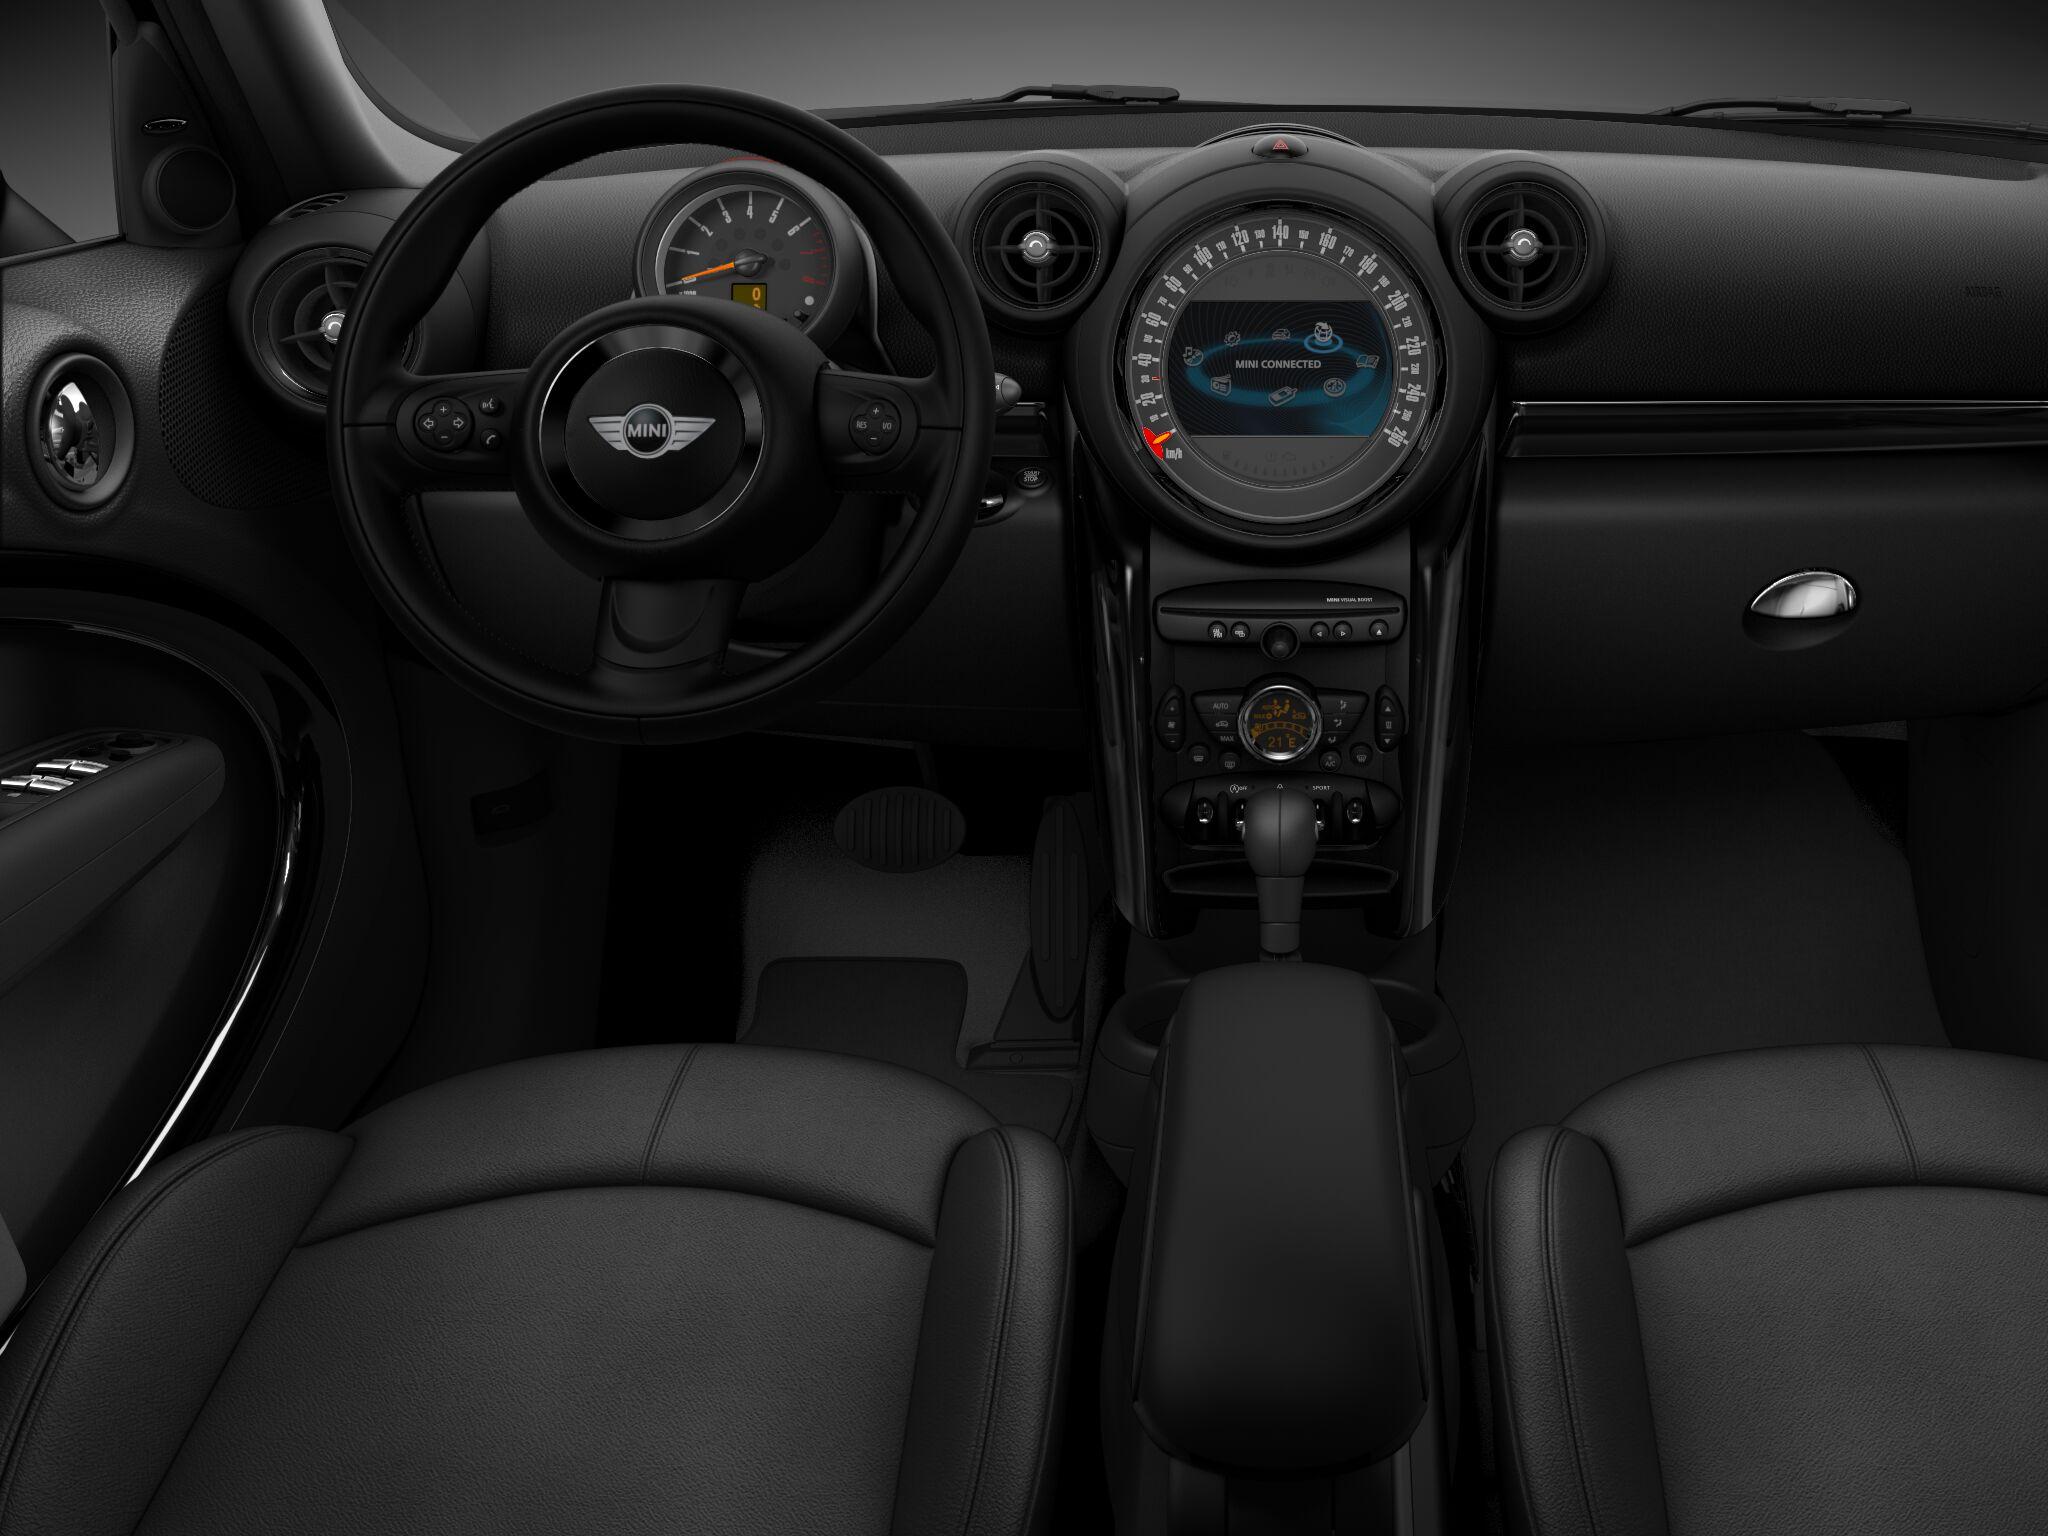 MINI Cooper Crossoverのコスモス・クロス・インテリア